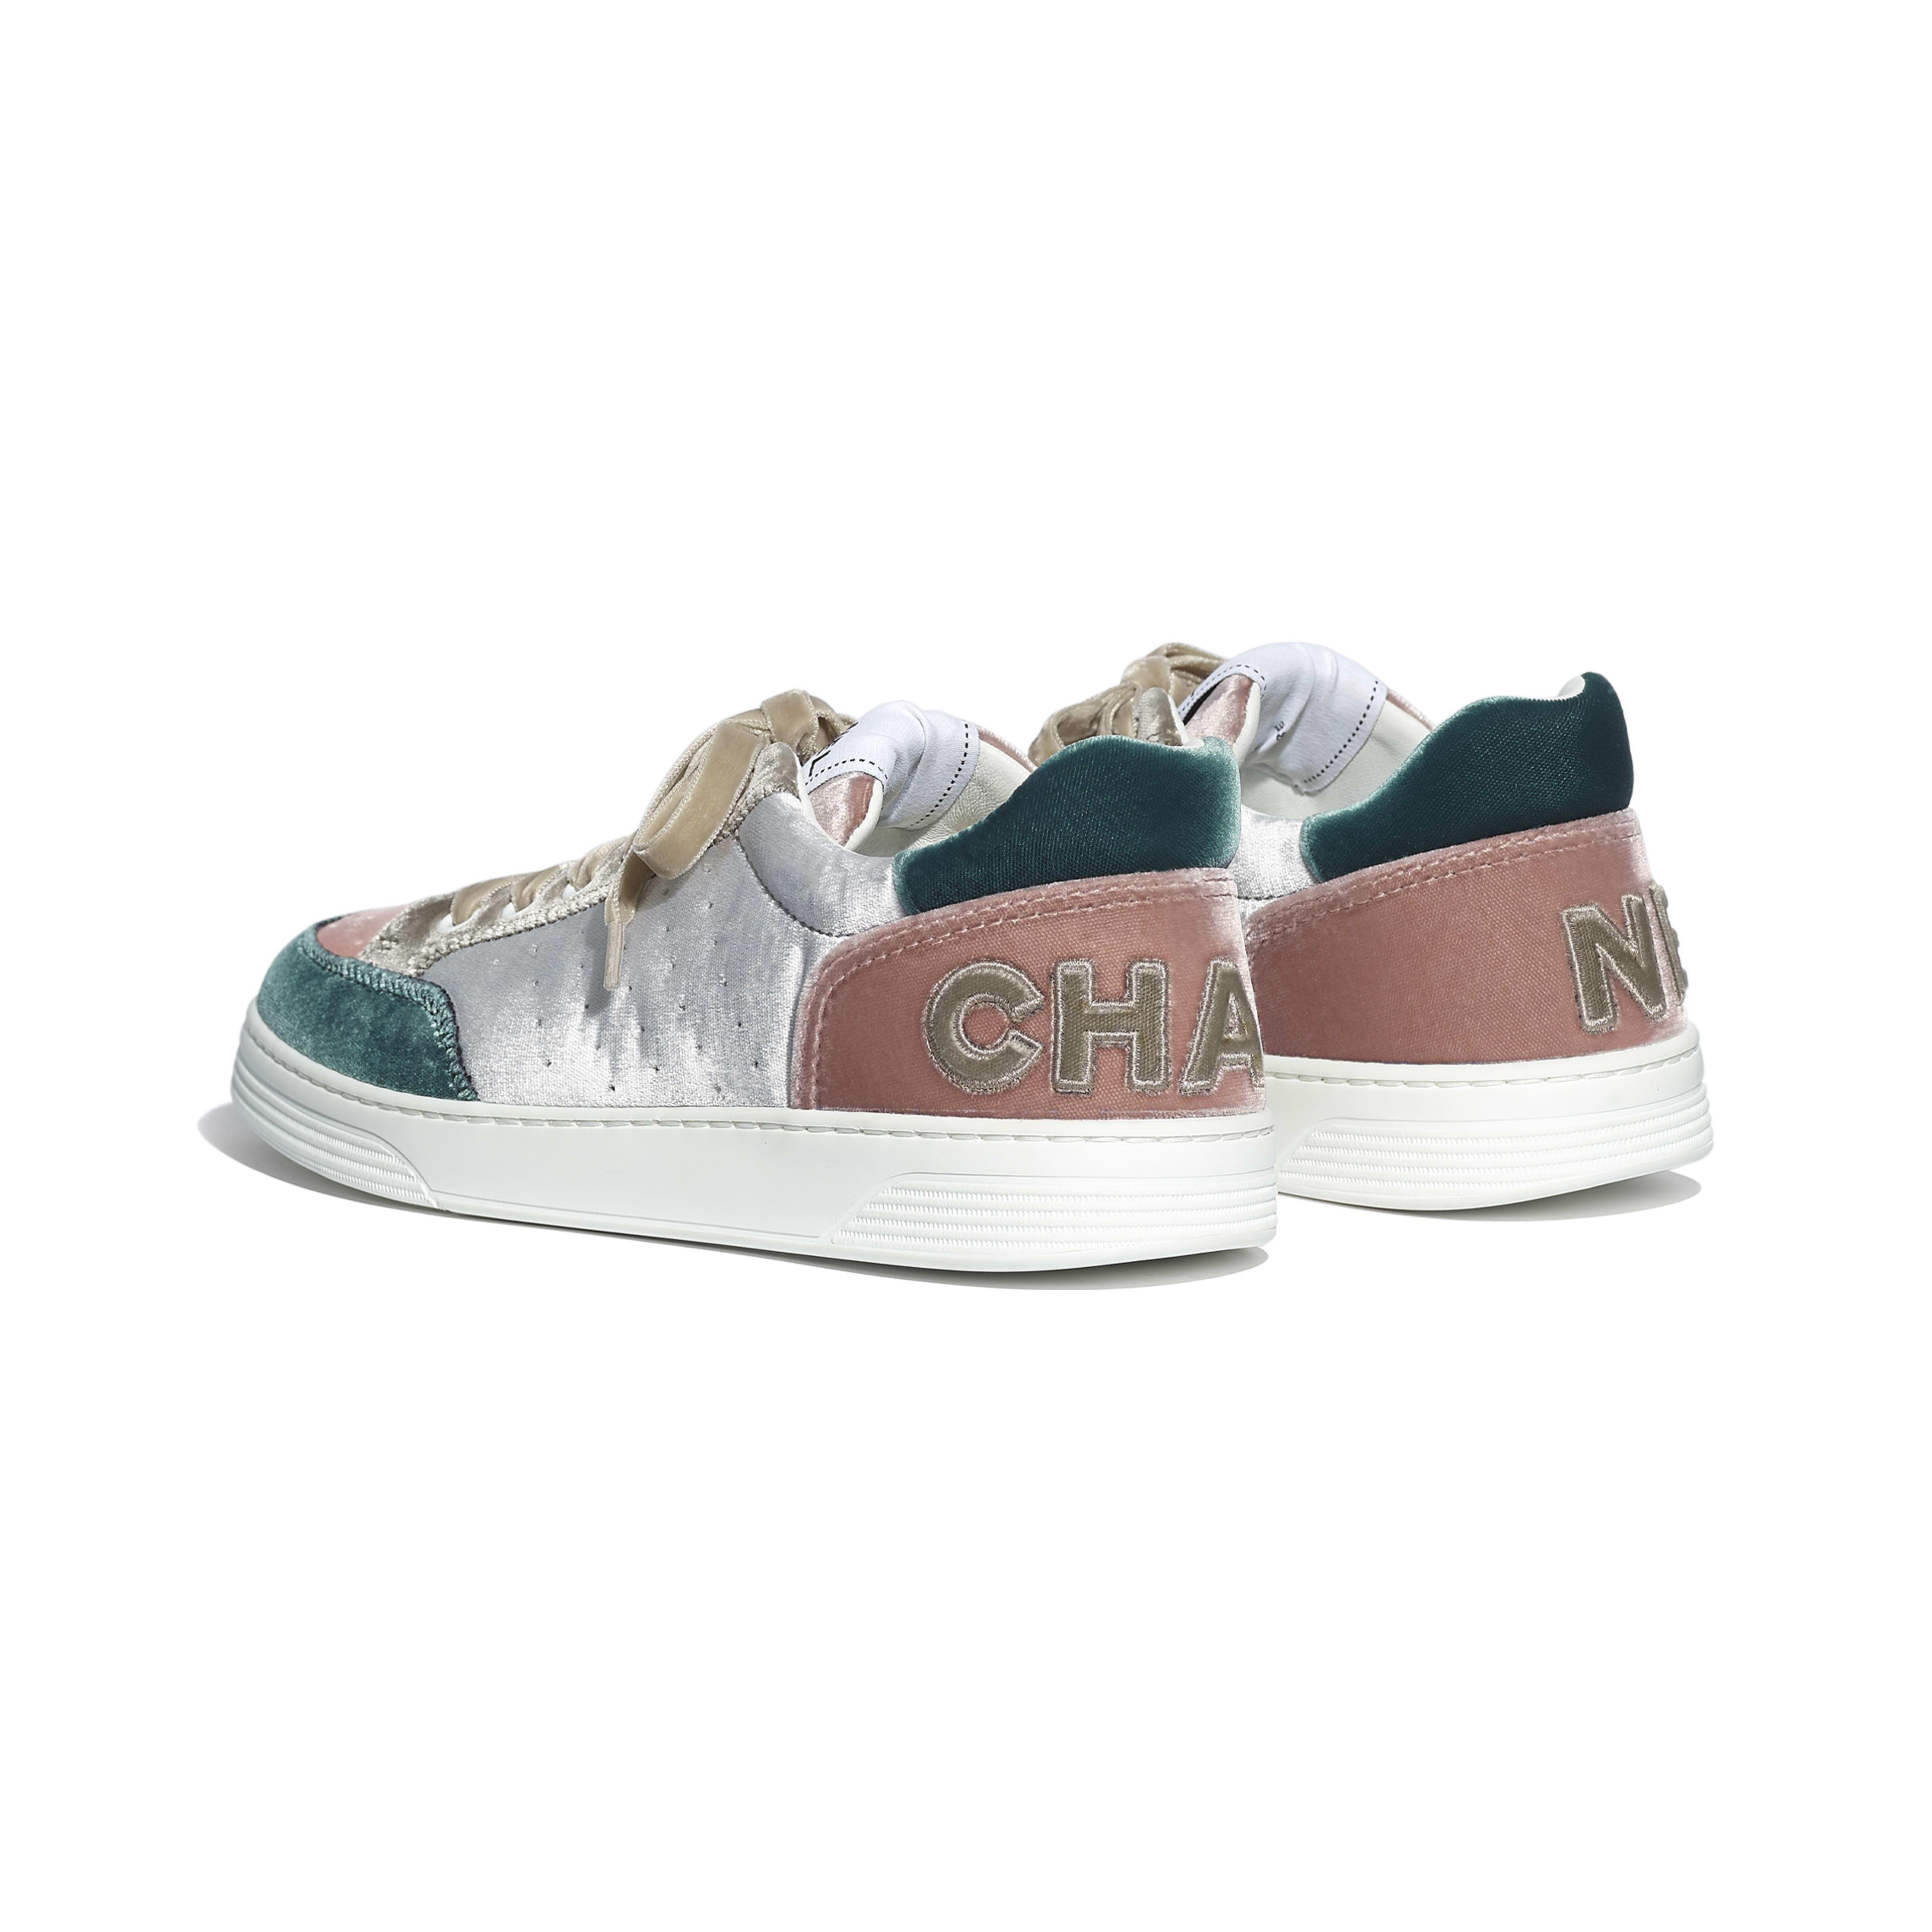 Velvet Gray, Pink \u0026 Green Sneakers | CHANEL